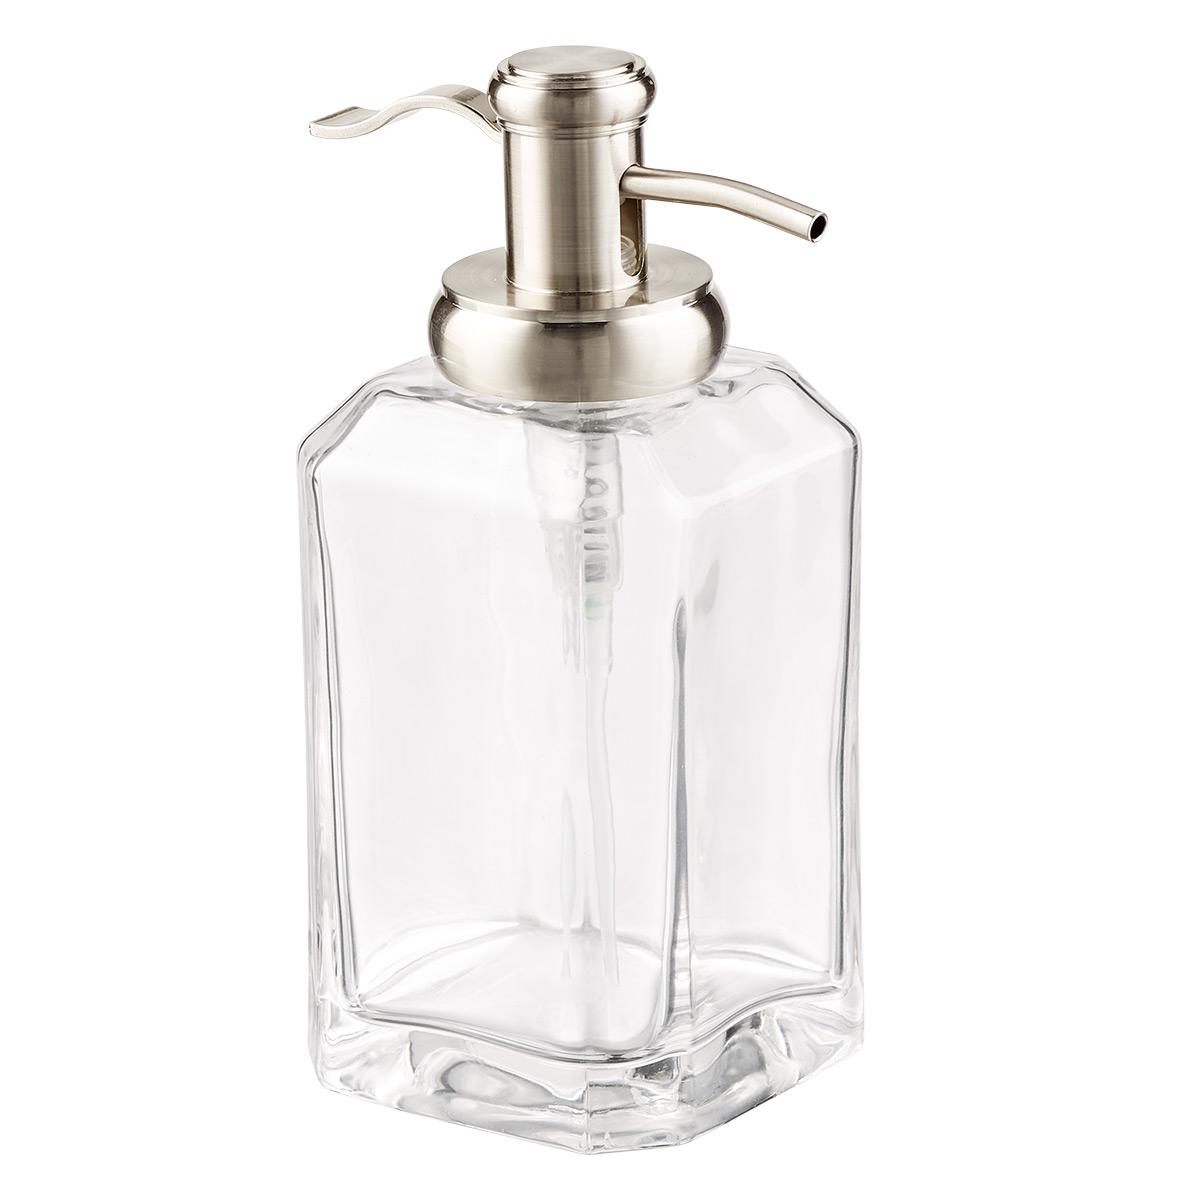 11.5 oz. Clear Glass Soap Dispenser